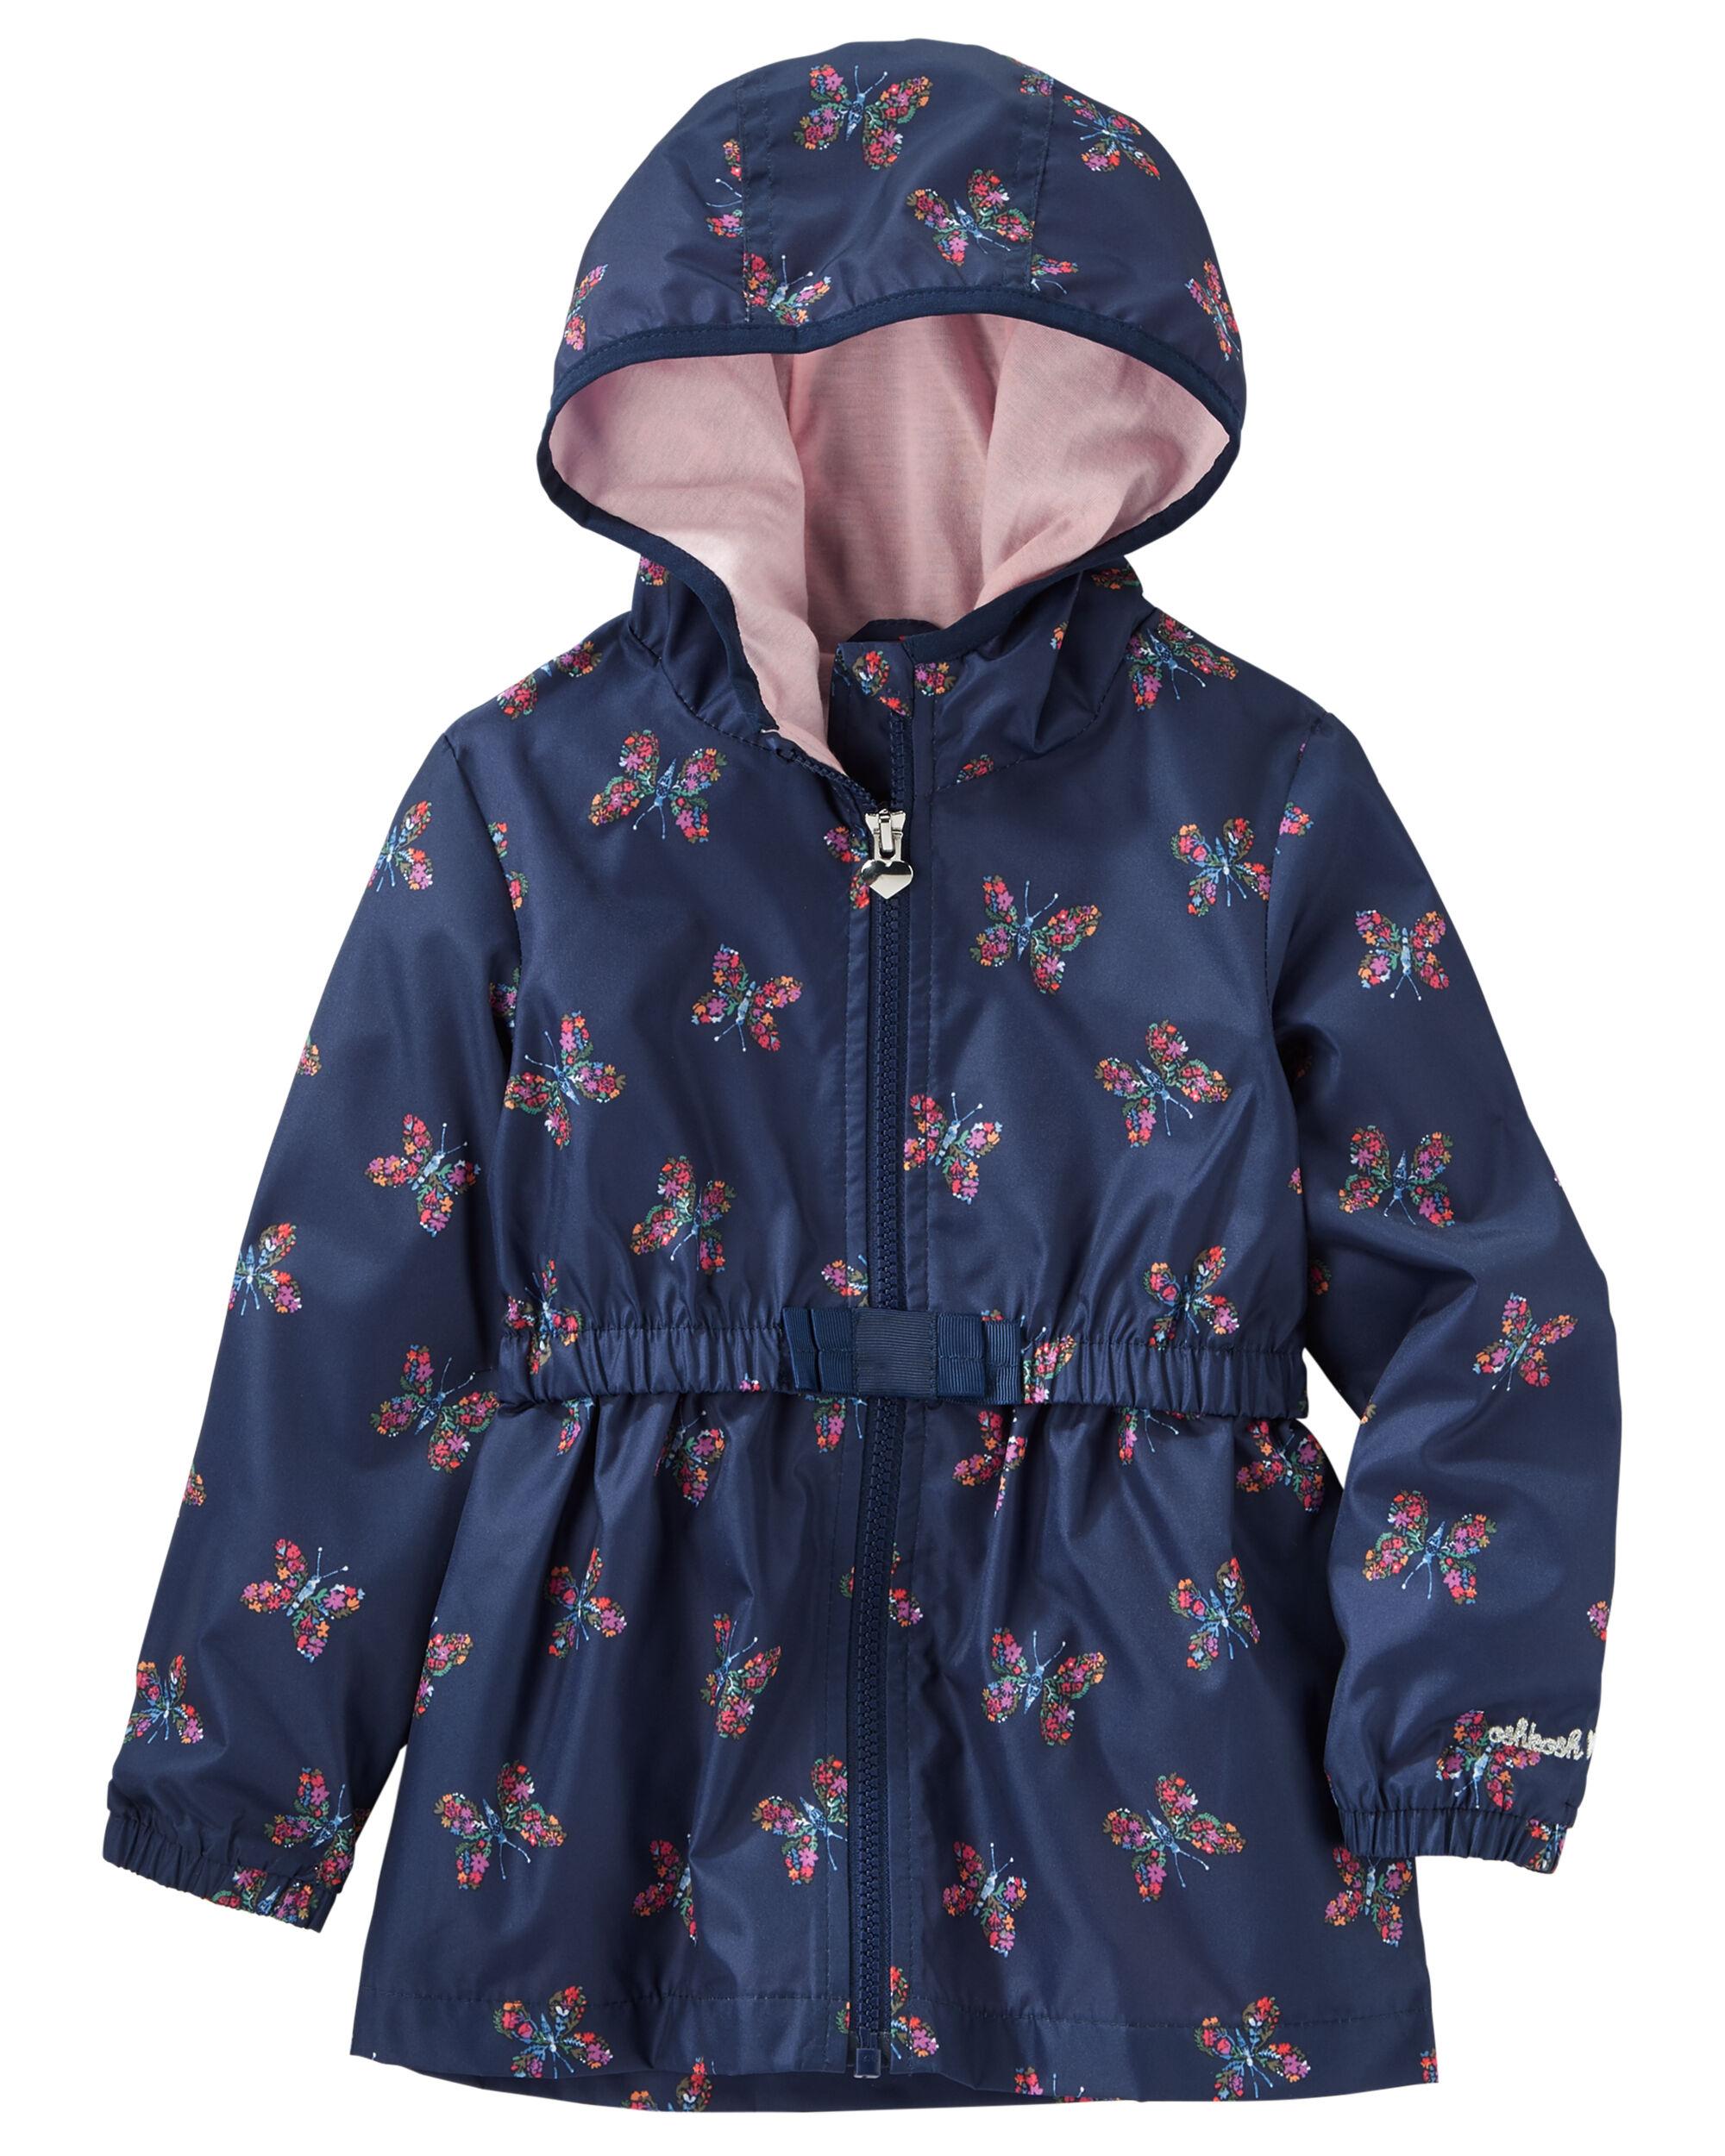 Butterfly Print Lightweight Hooded Jacket | OshKosh.com